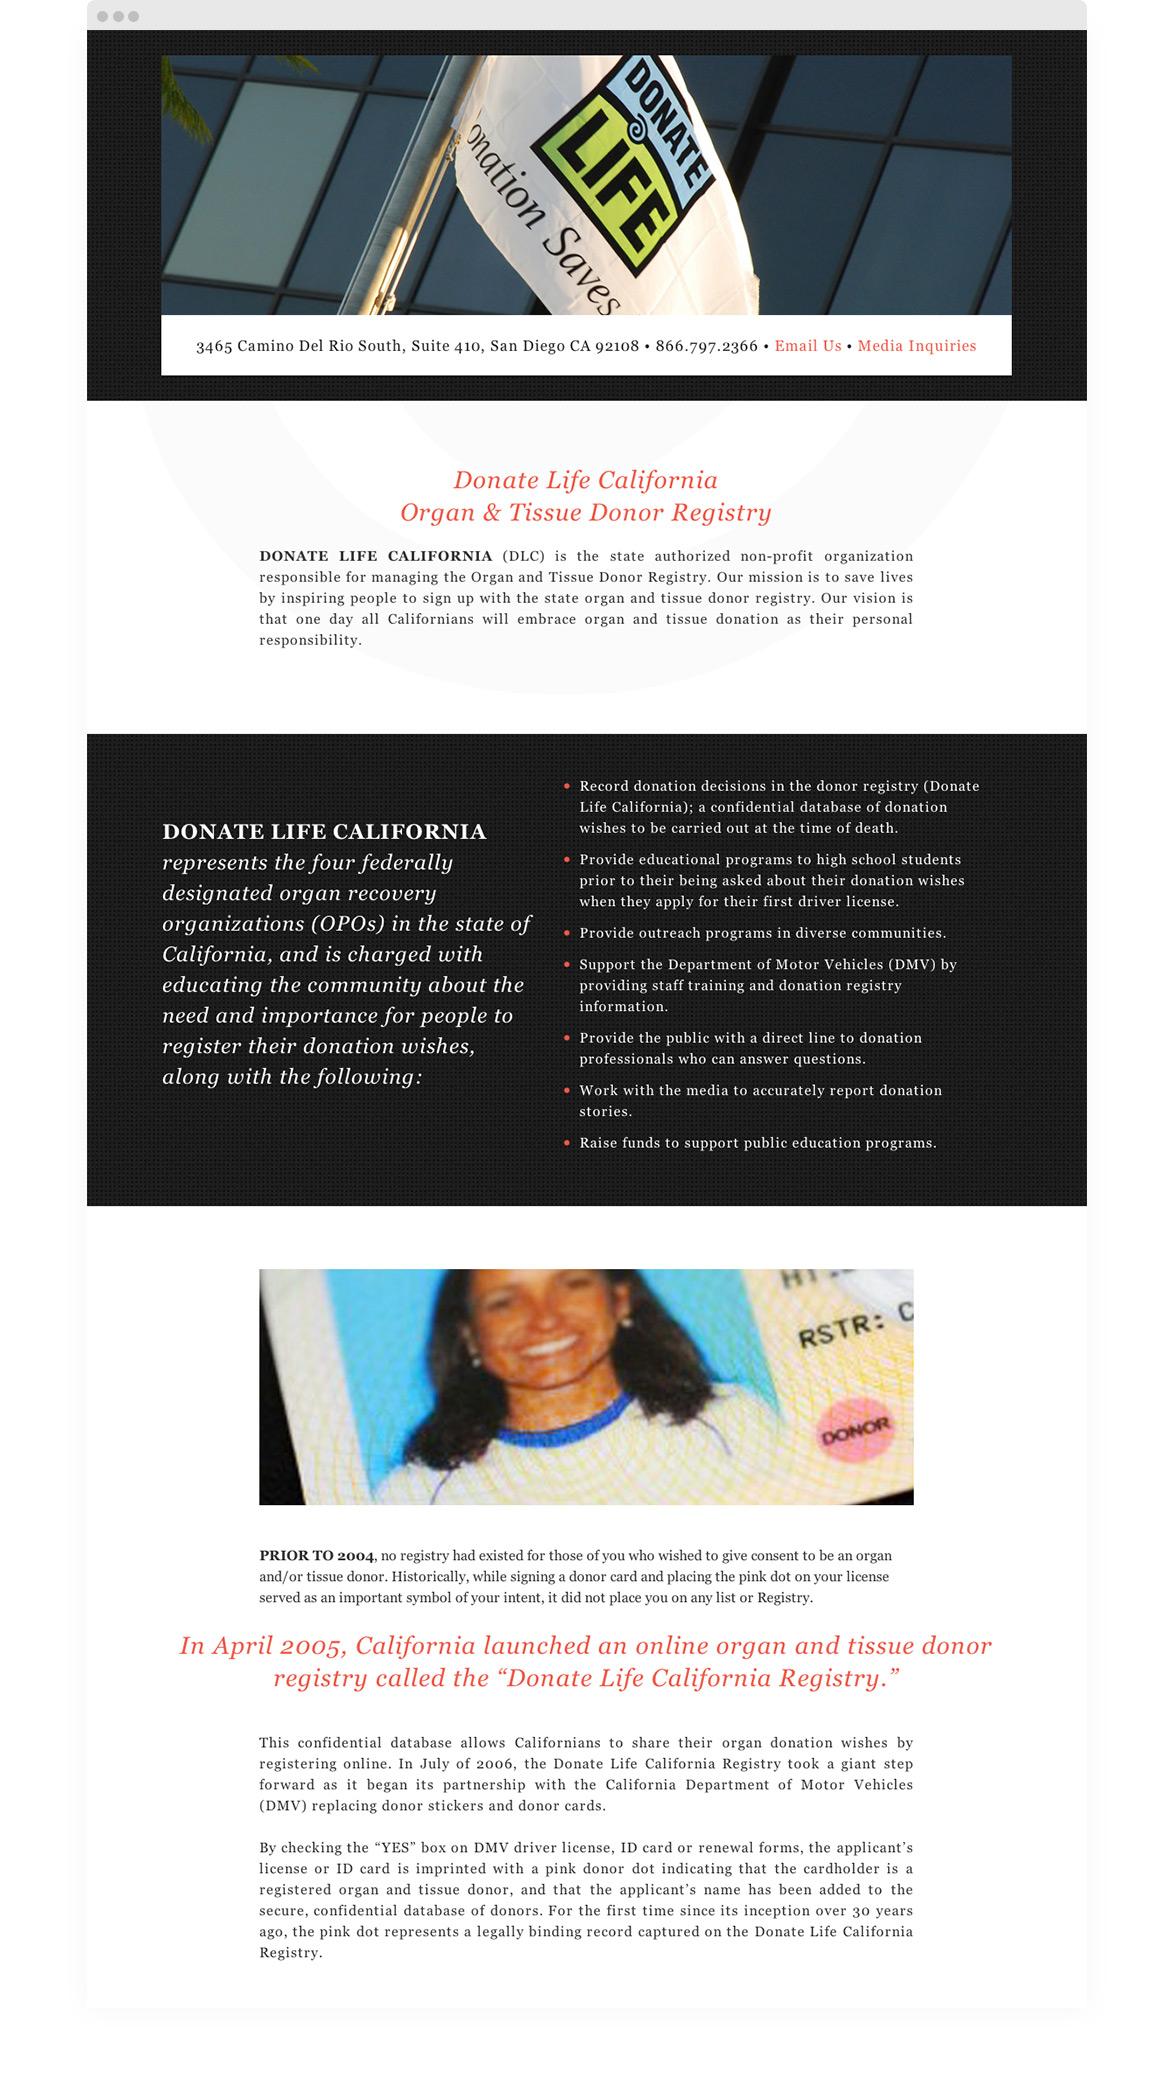 Kymera - Donate Life California